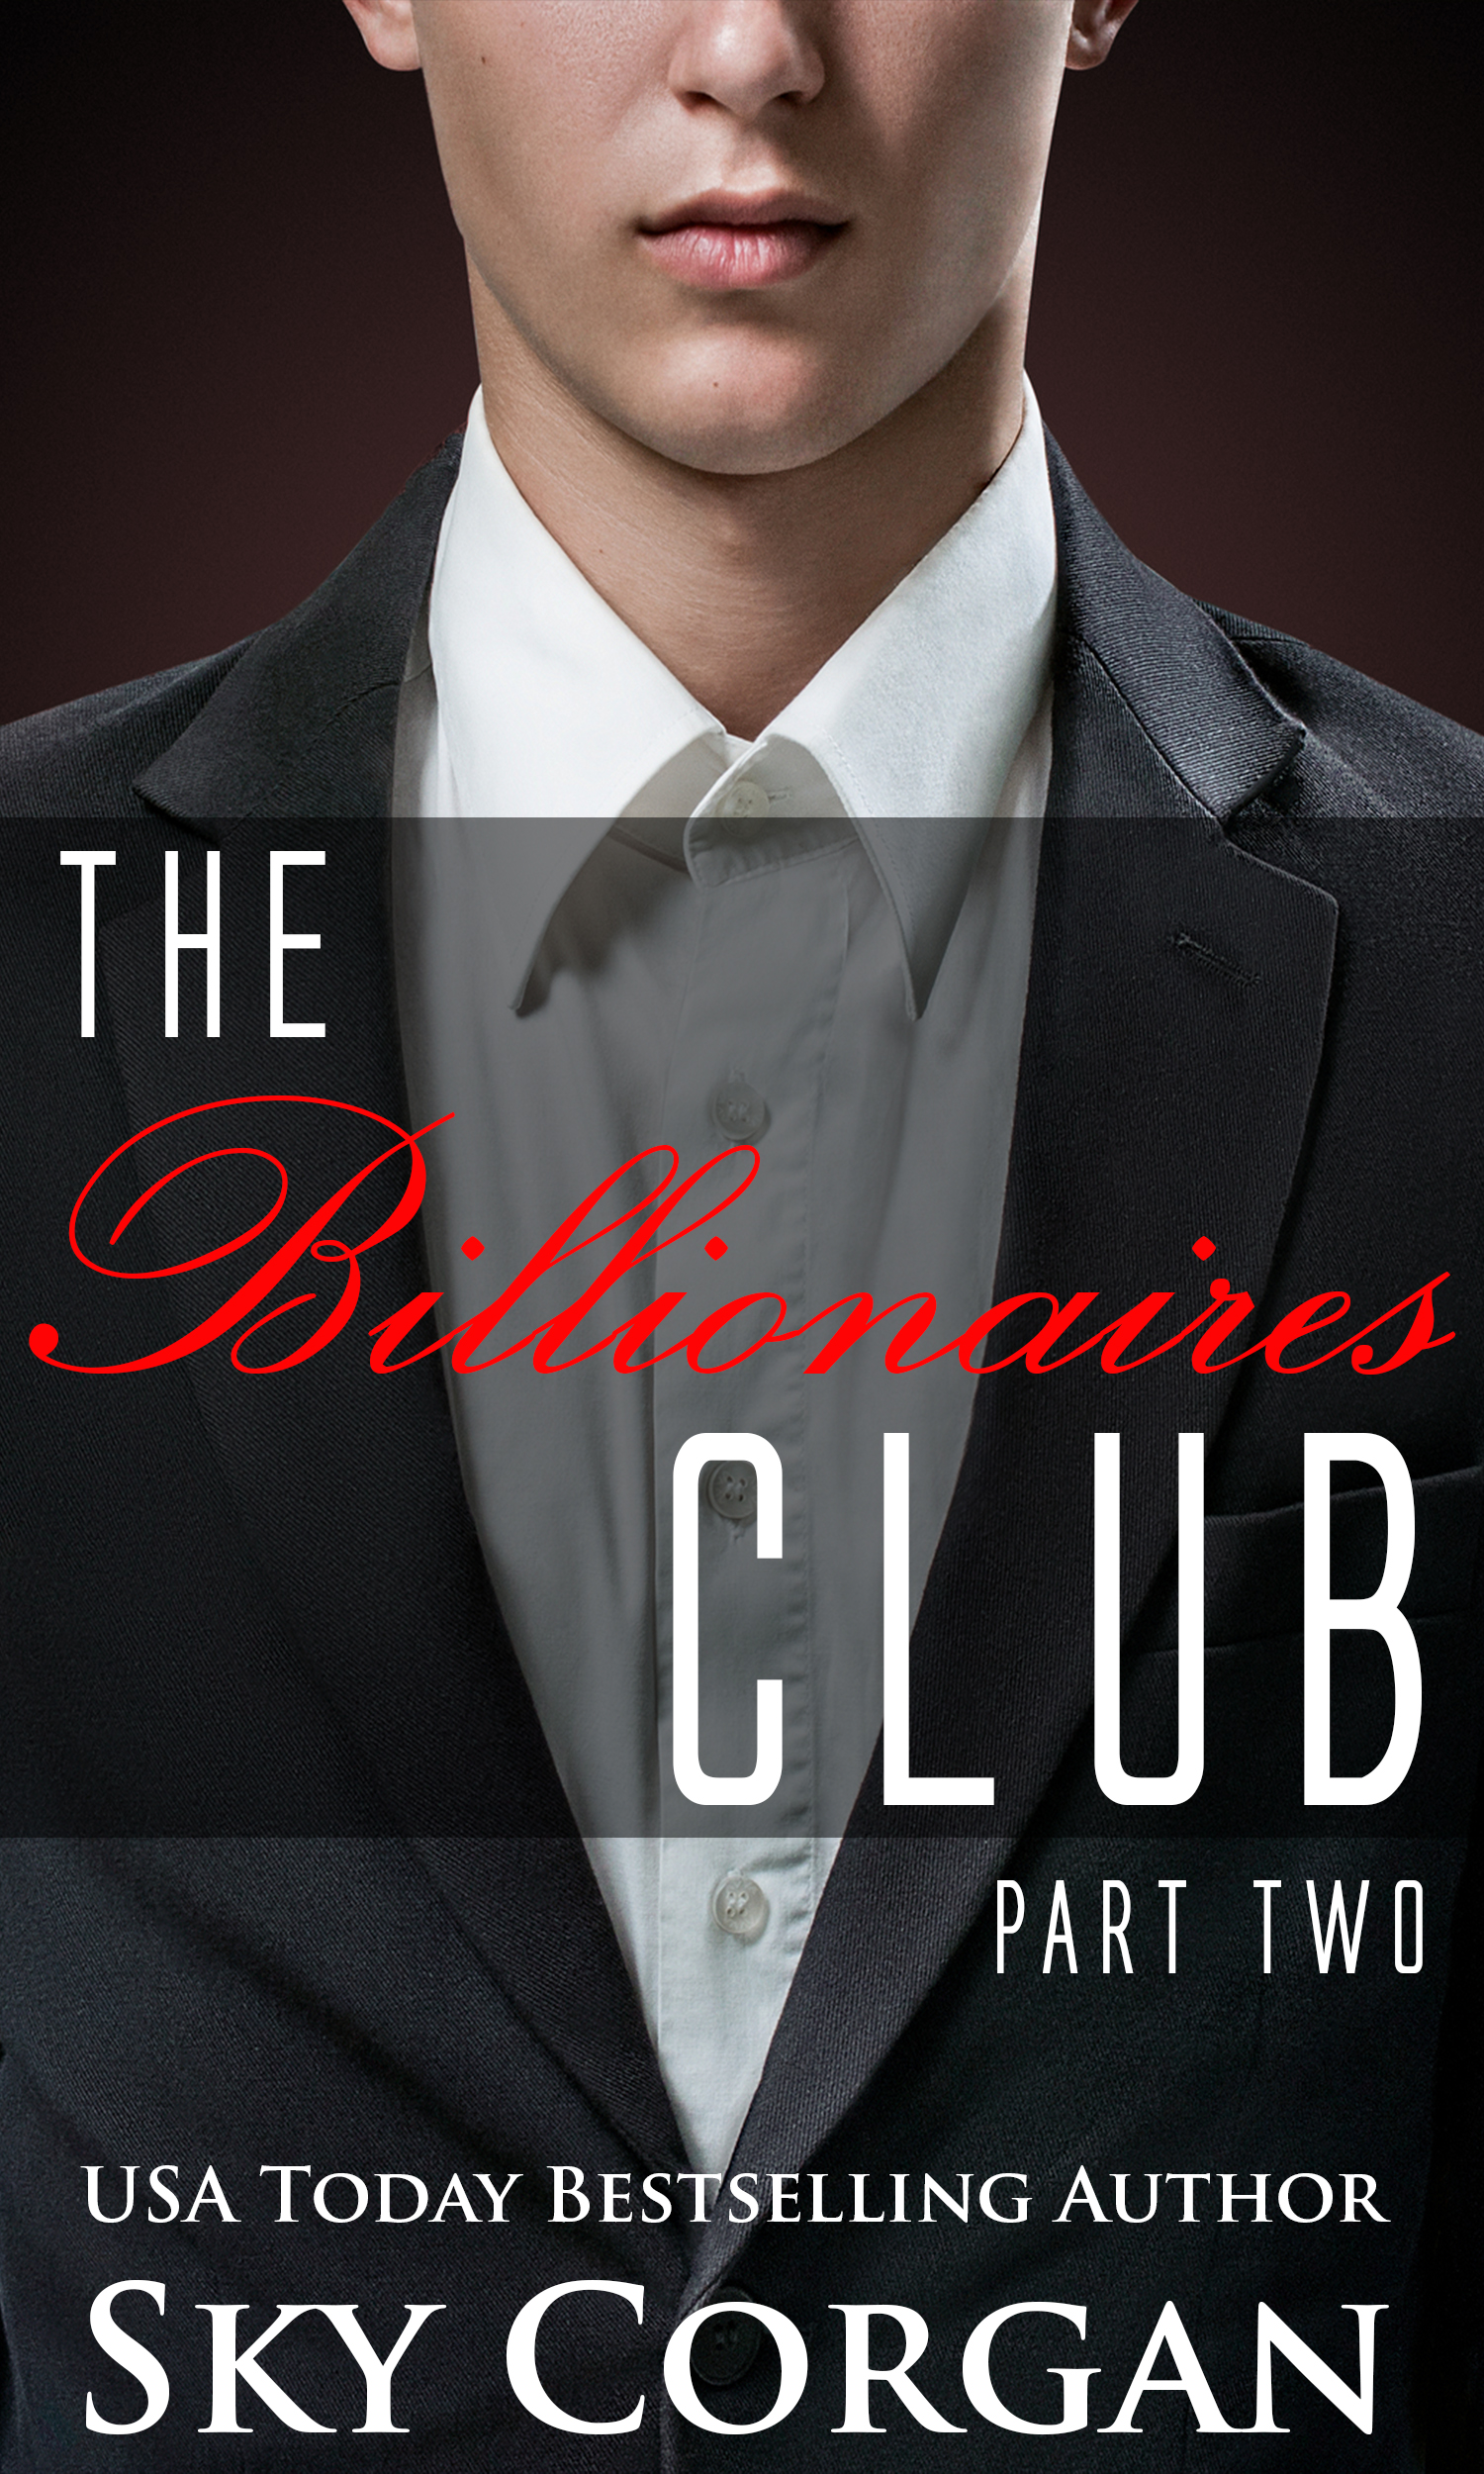 The billionaires club: part two